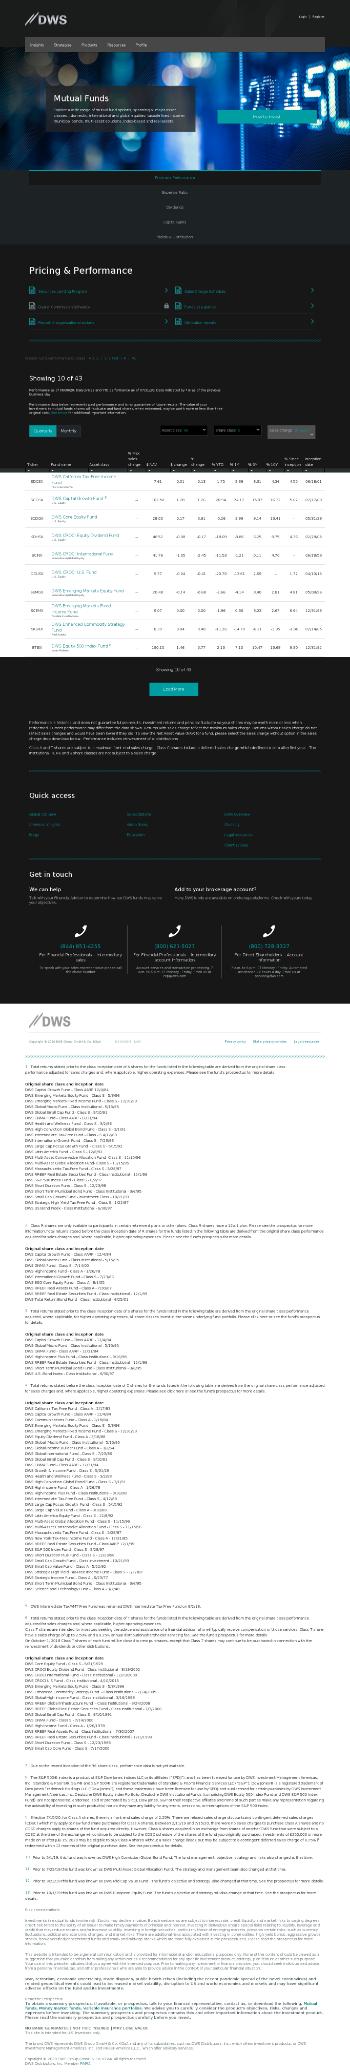 The European Equity Fund, Inc. Website Screenshot